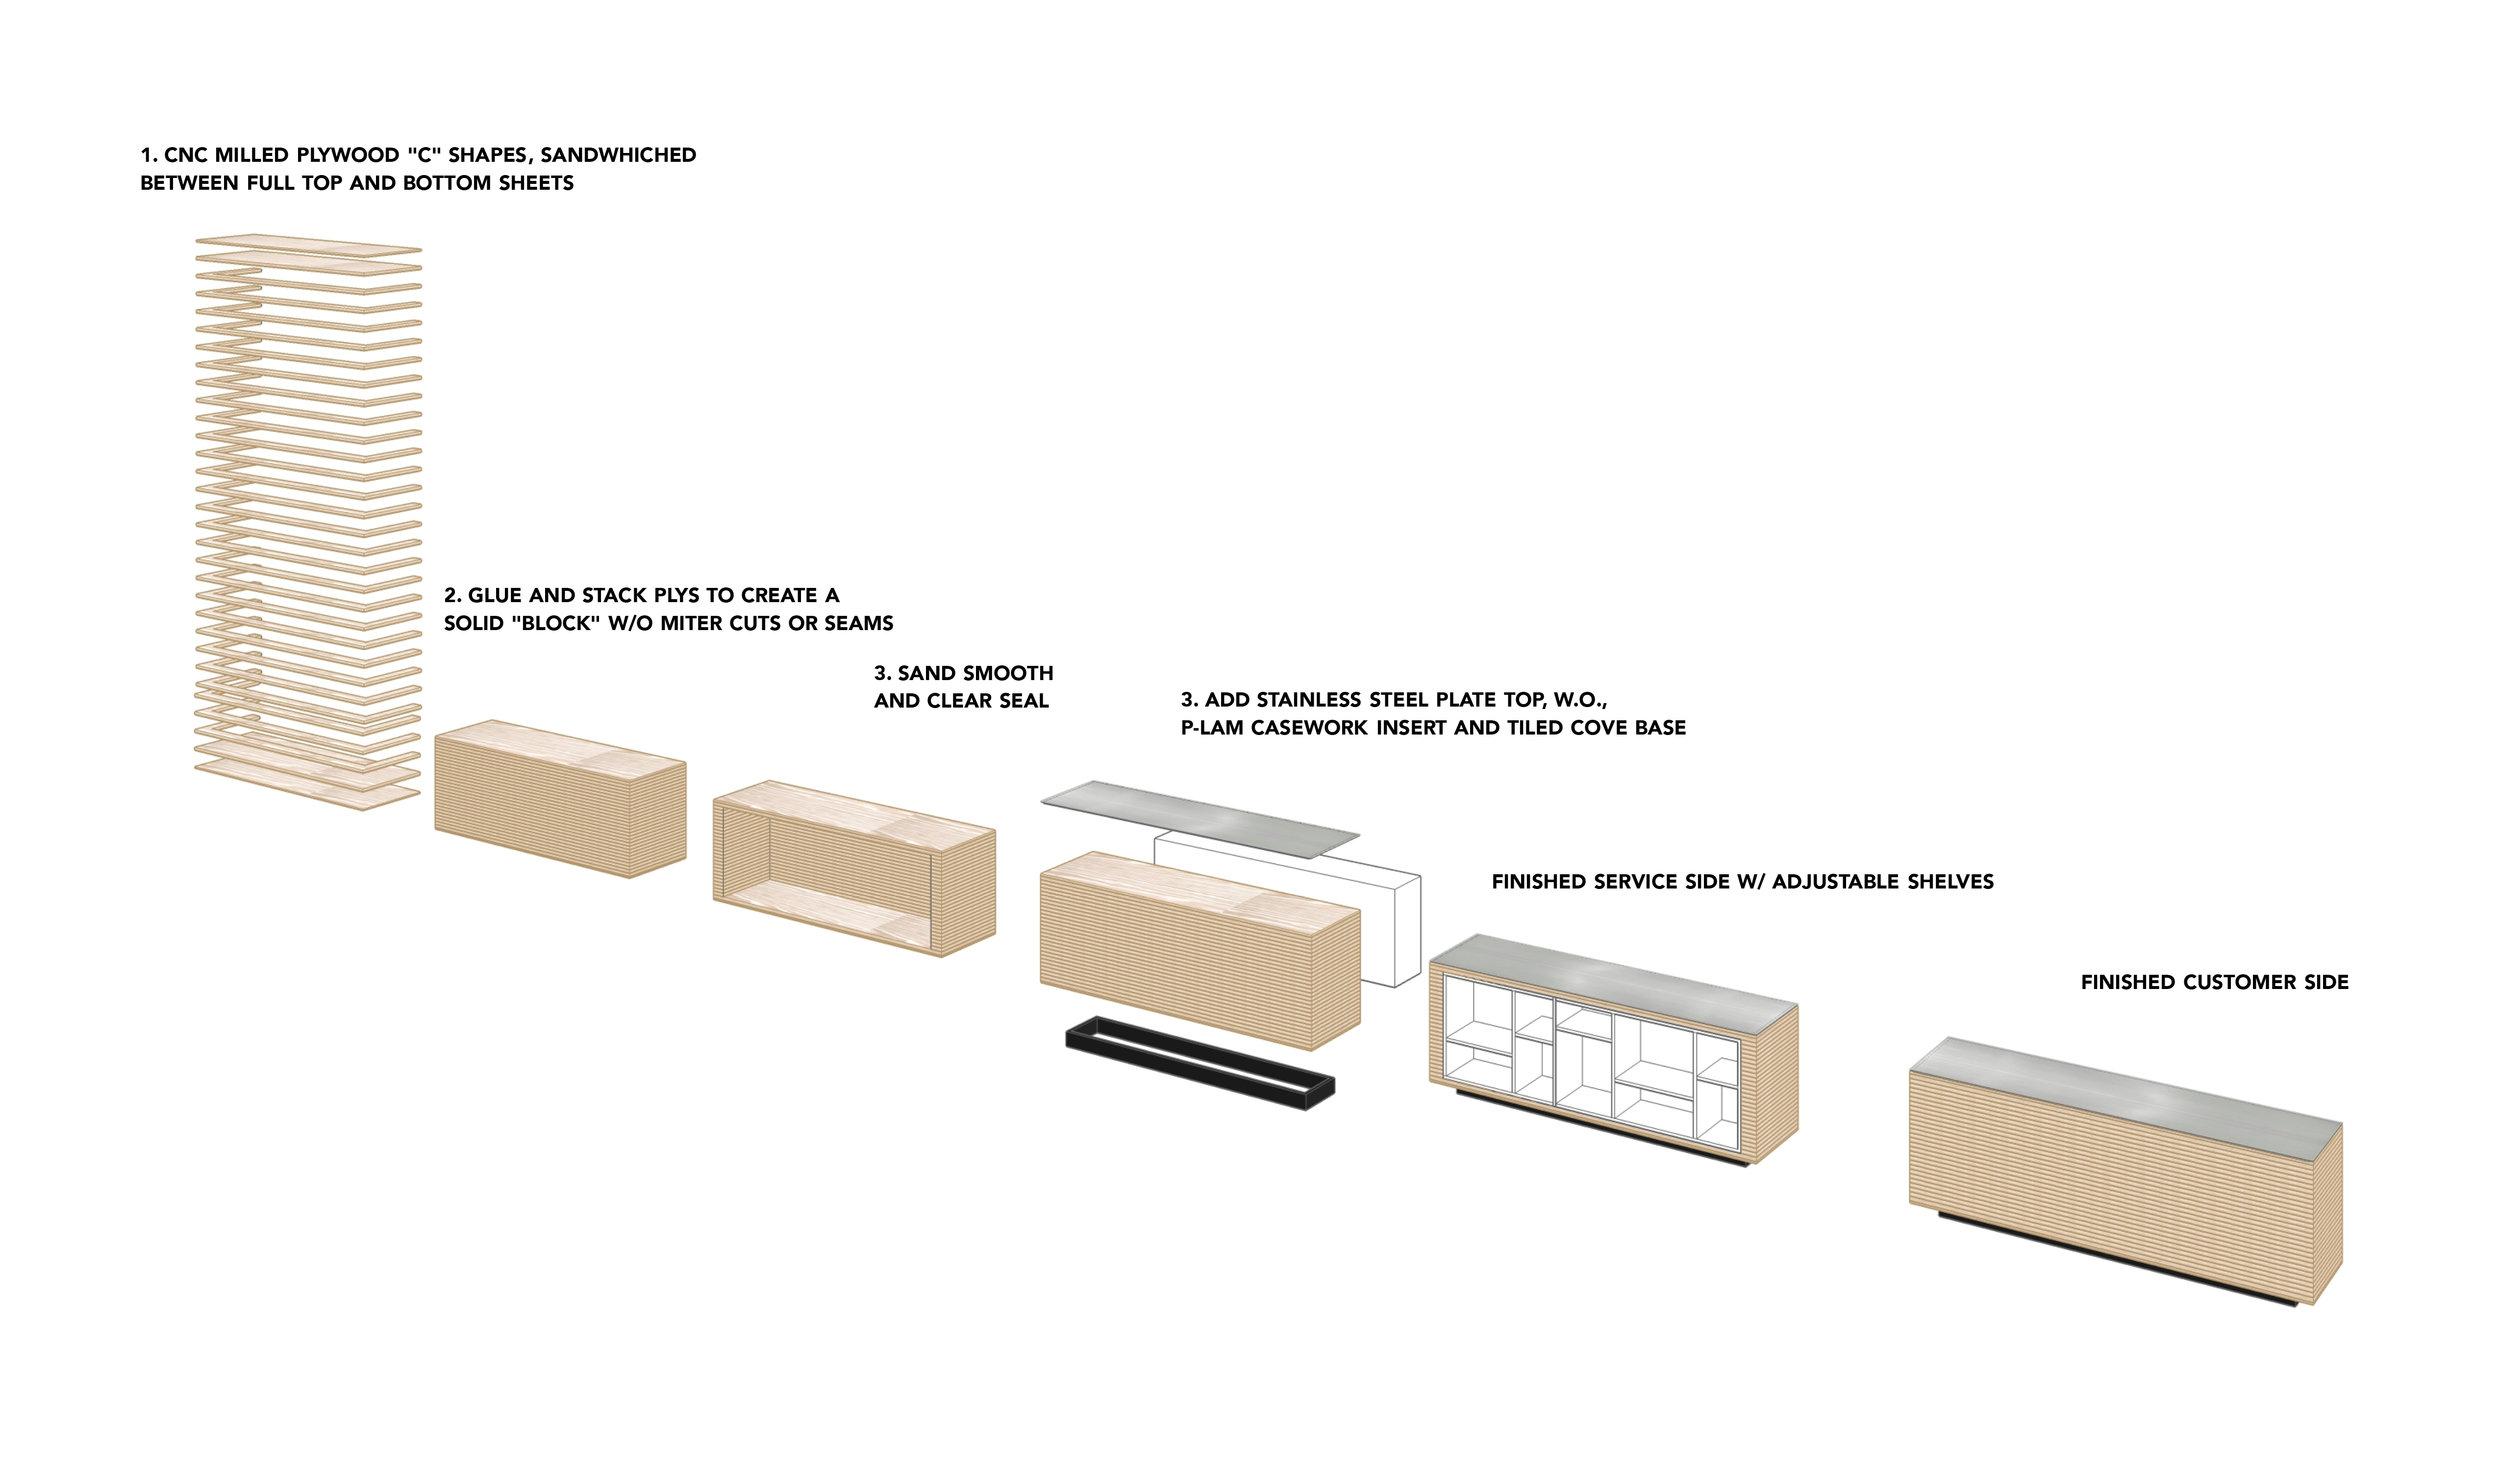 BBBK stacked ply diagram.jpg